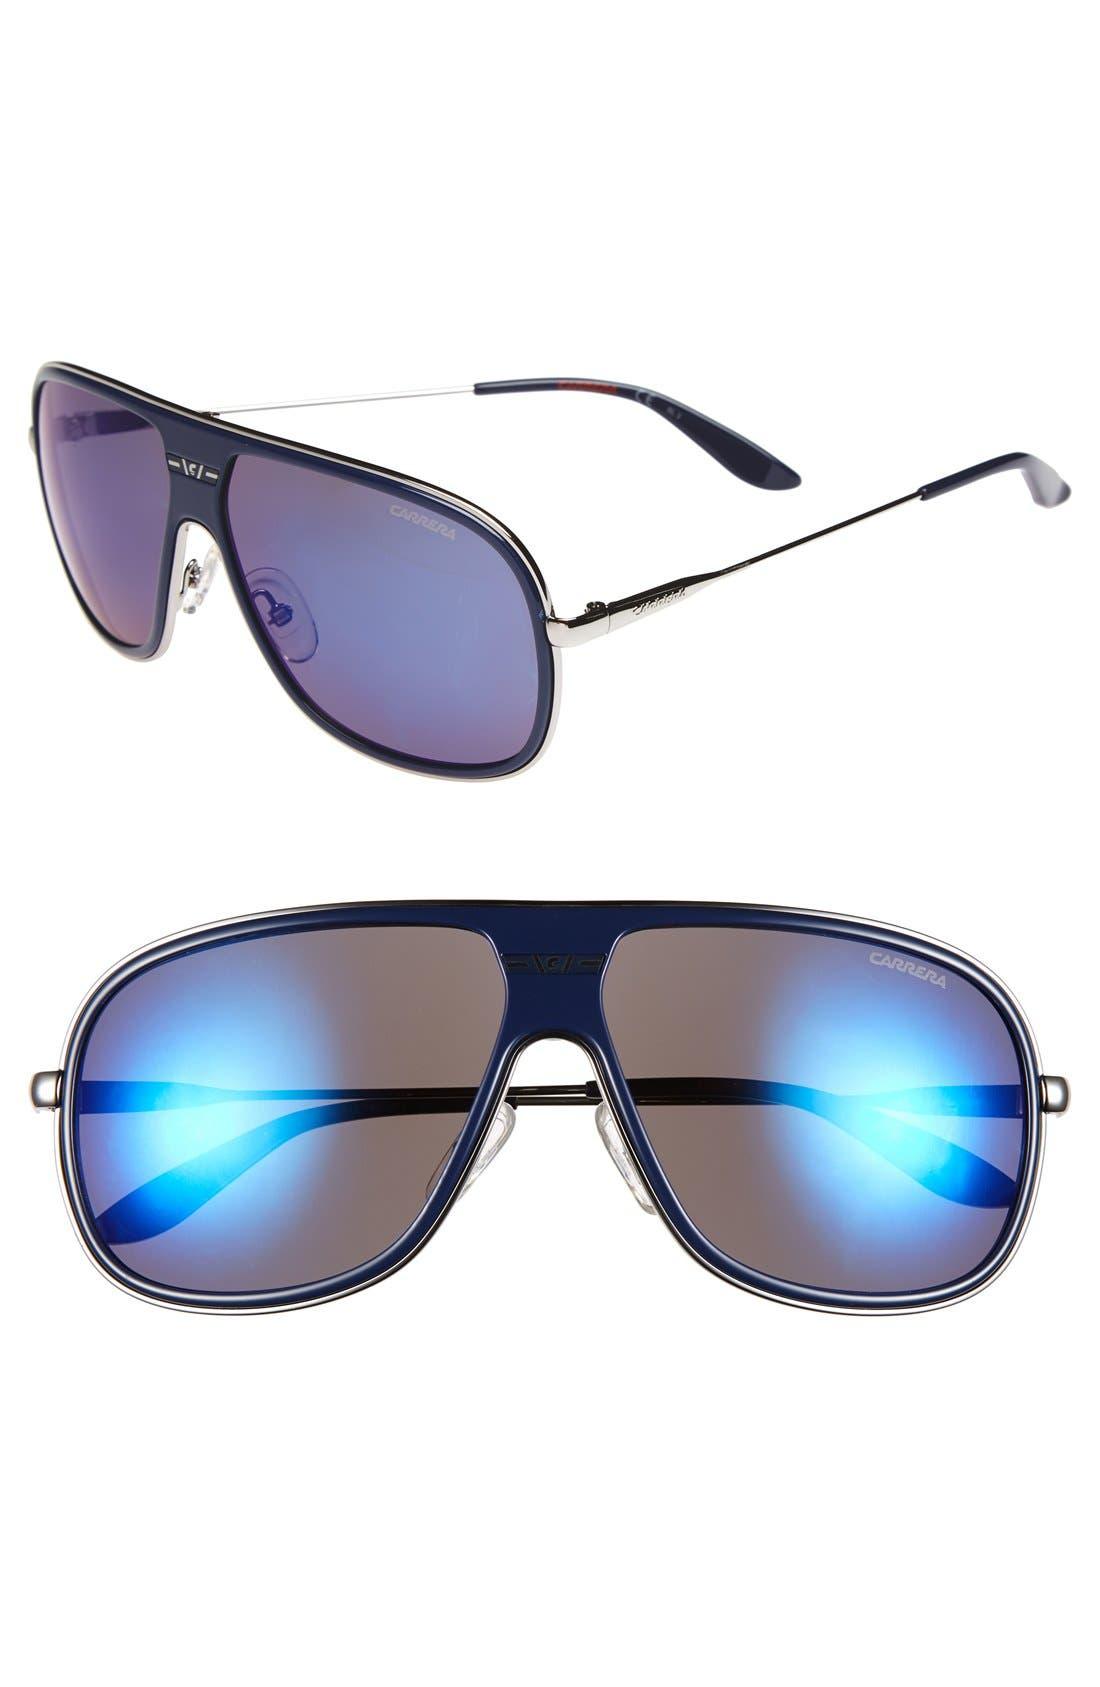 62mm Aviator Sunglasses,                             Main thumbnail 1, color,                             400